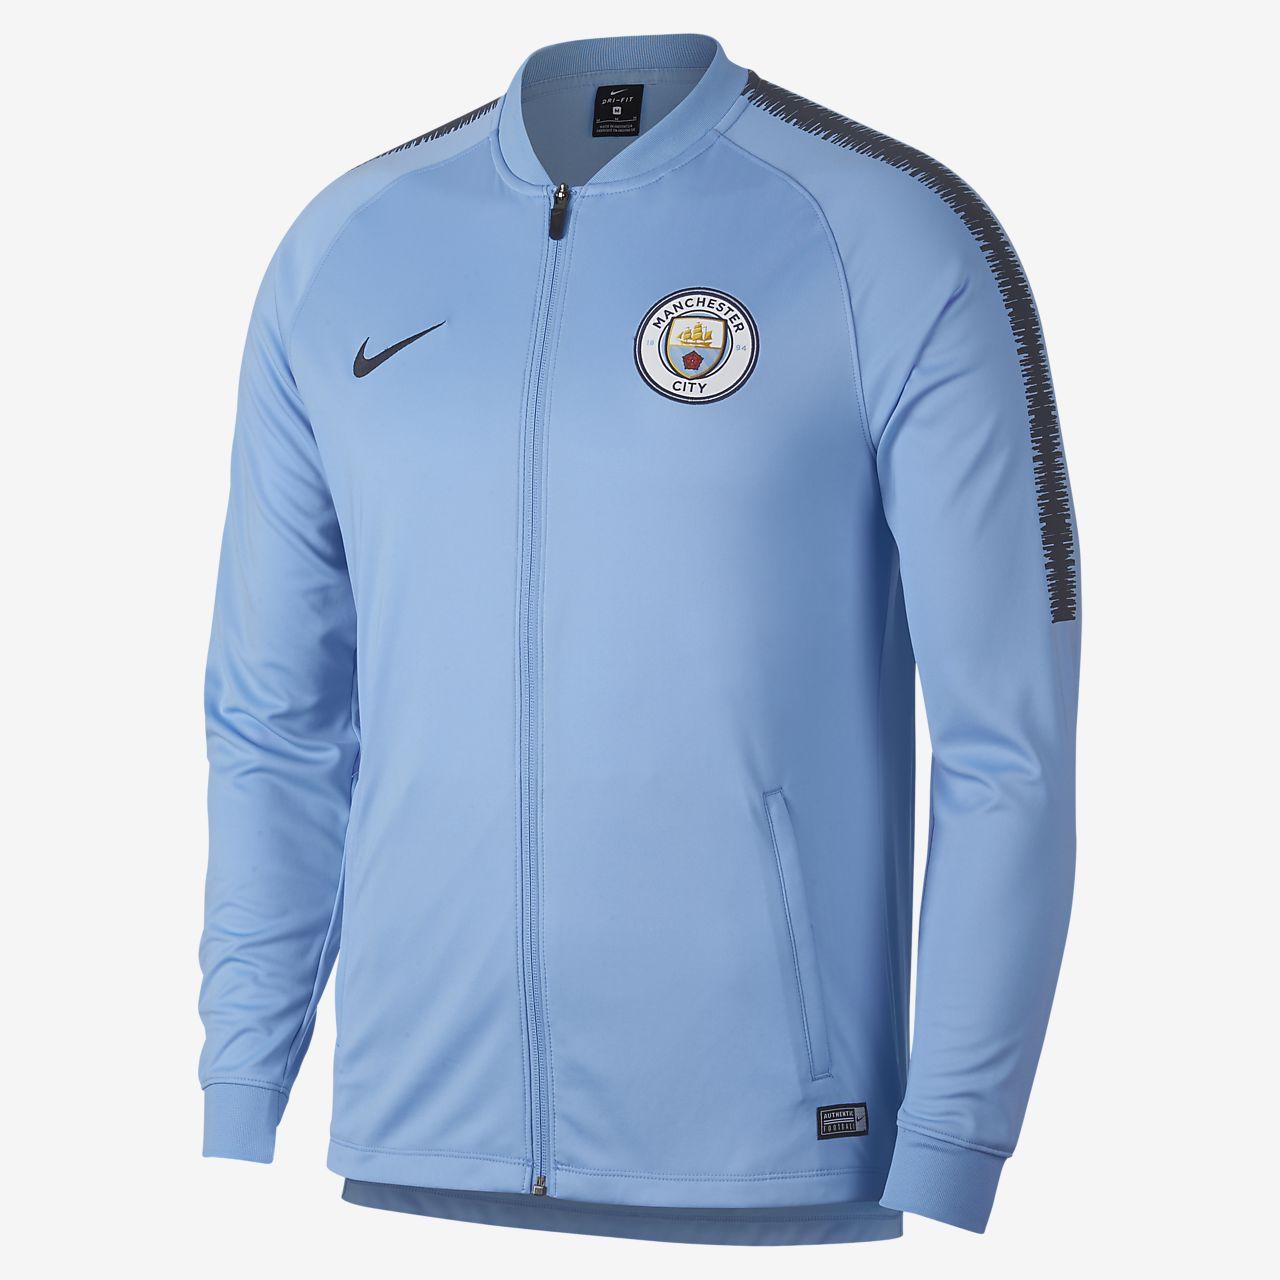 4462600eab8 Pánská fotbalová bunda Manchester City FC Dri-FIT Squad. Nike.com CZ